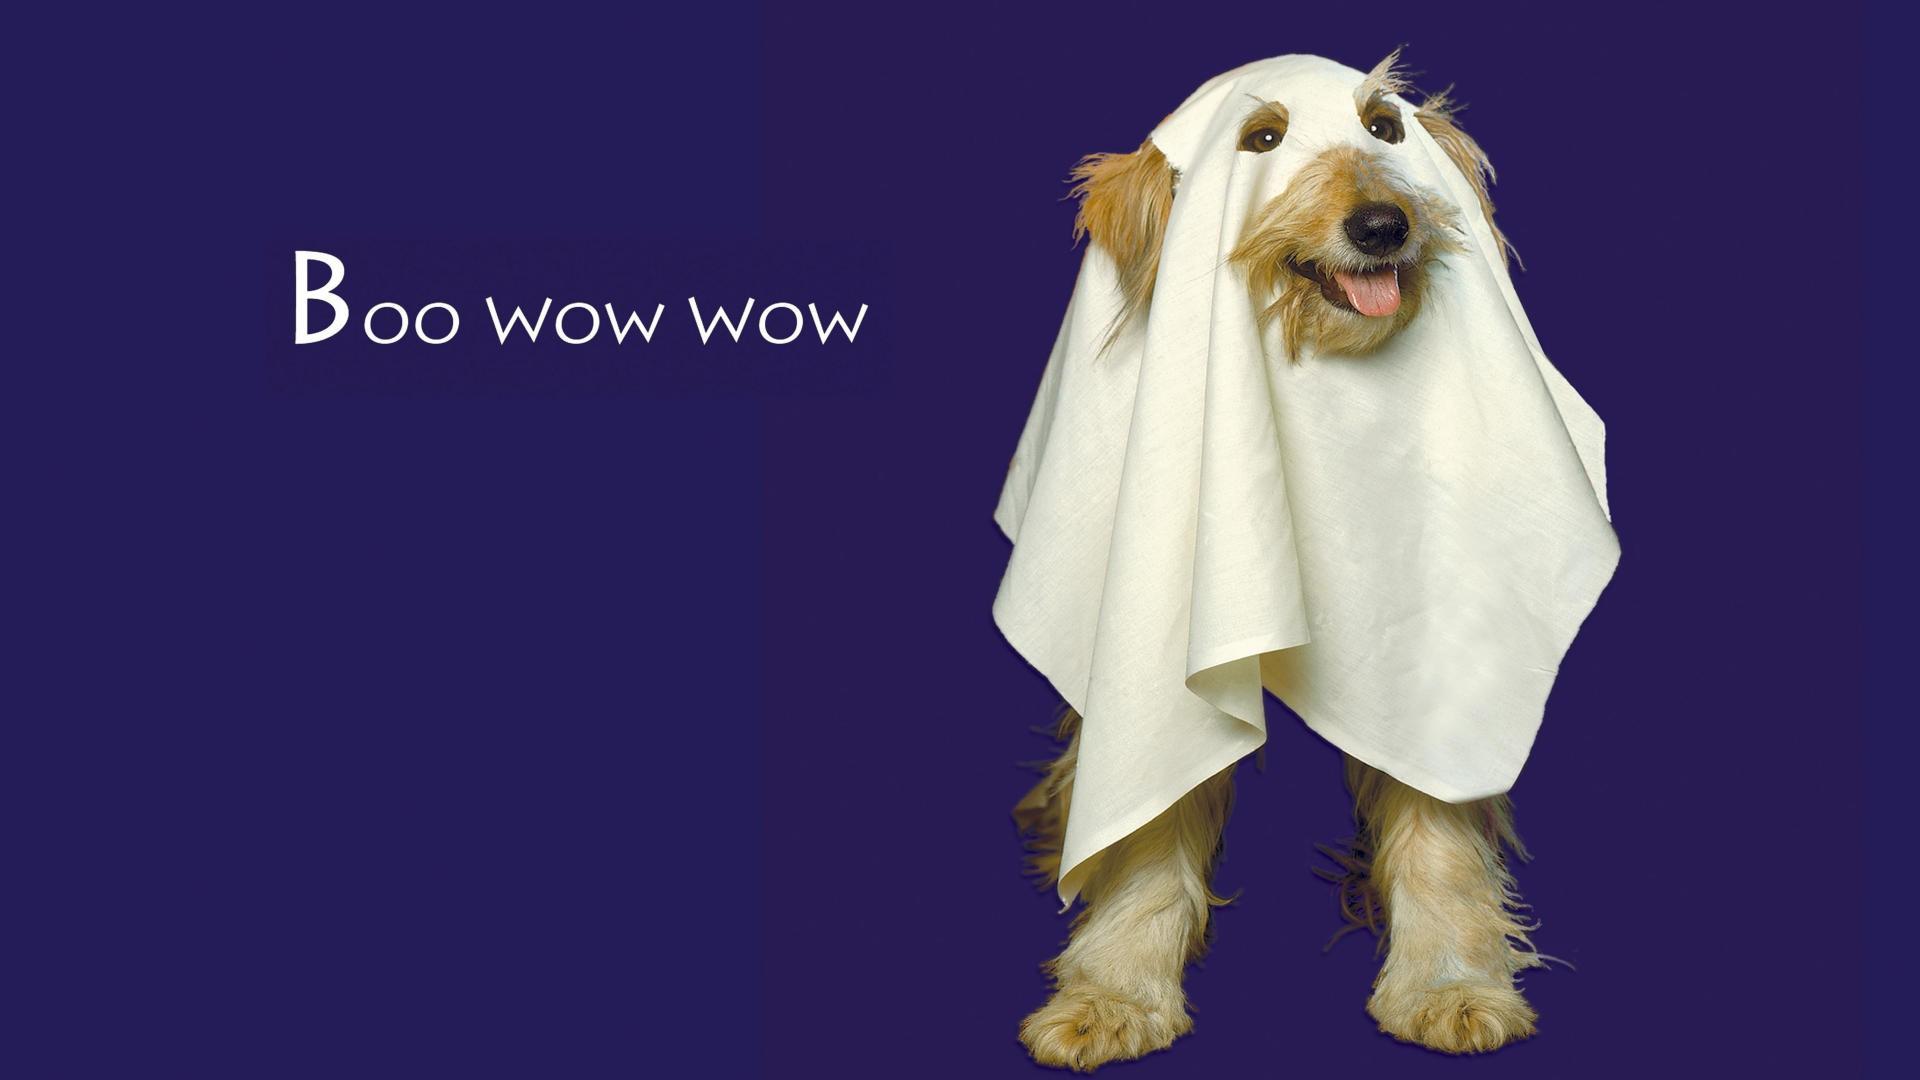 Holiday - Halloween  Dog Wallpaper